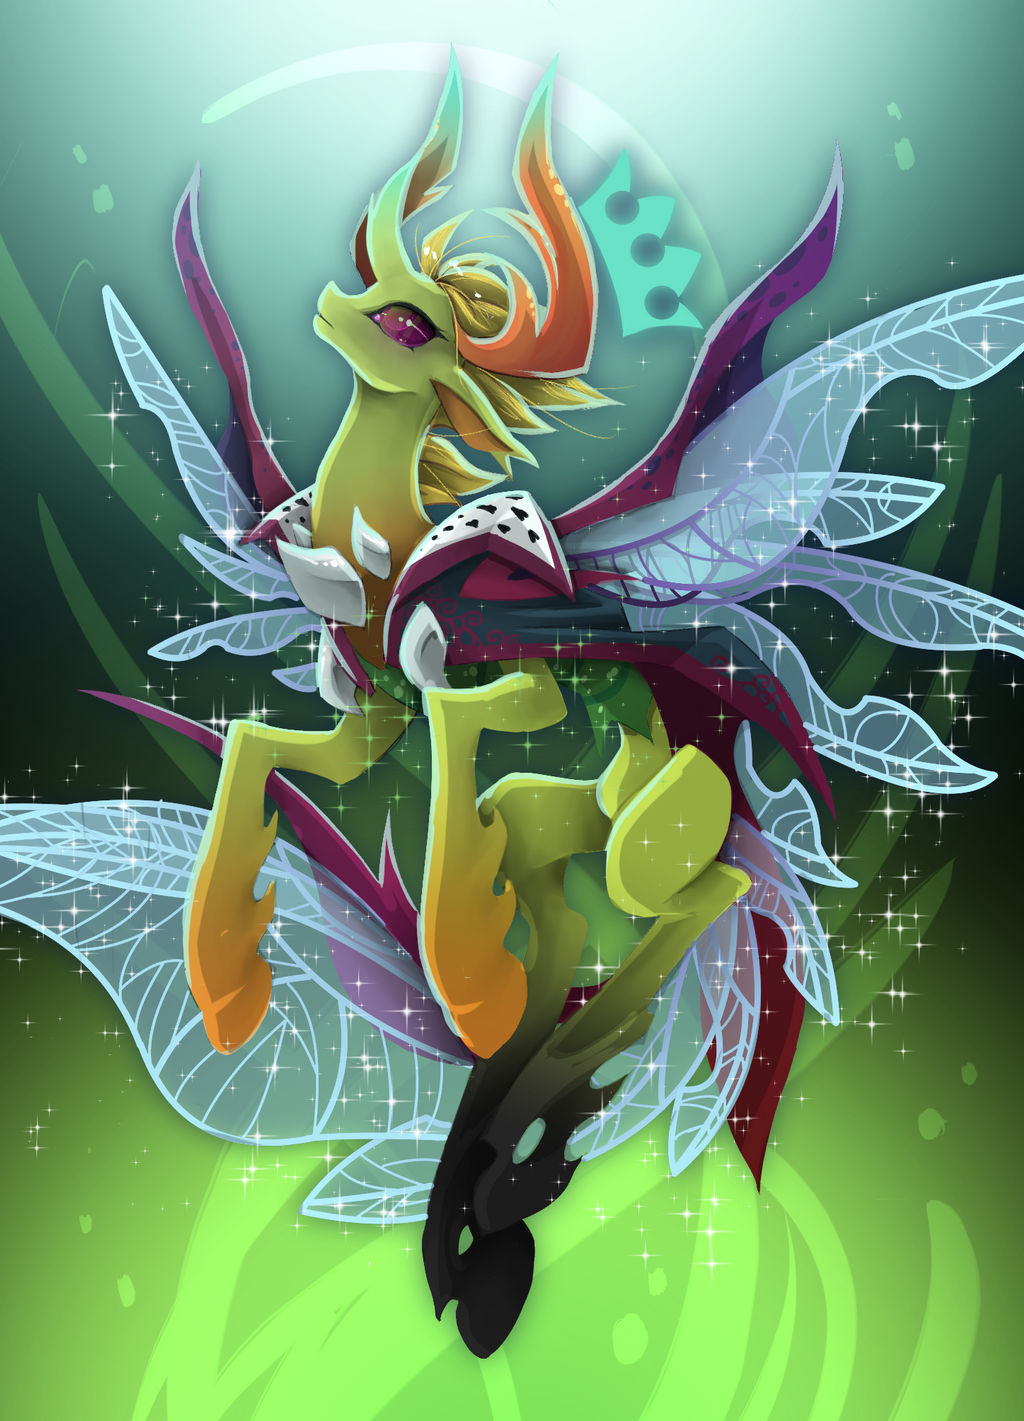 Thorax, King of Swarm